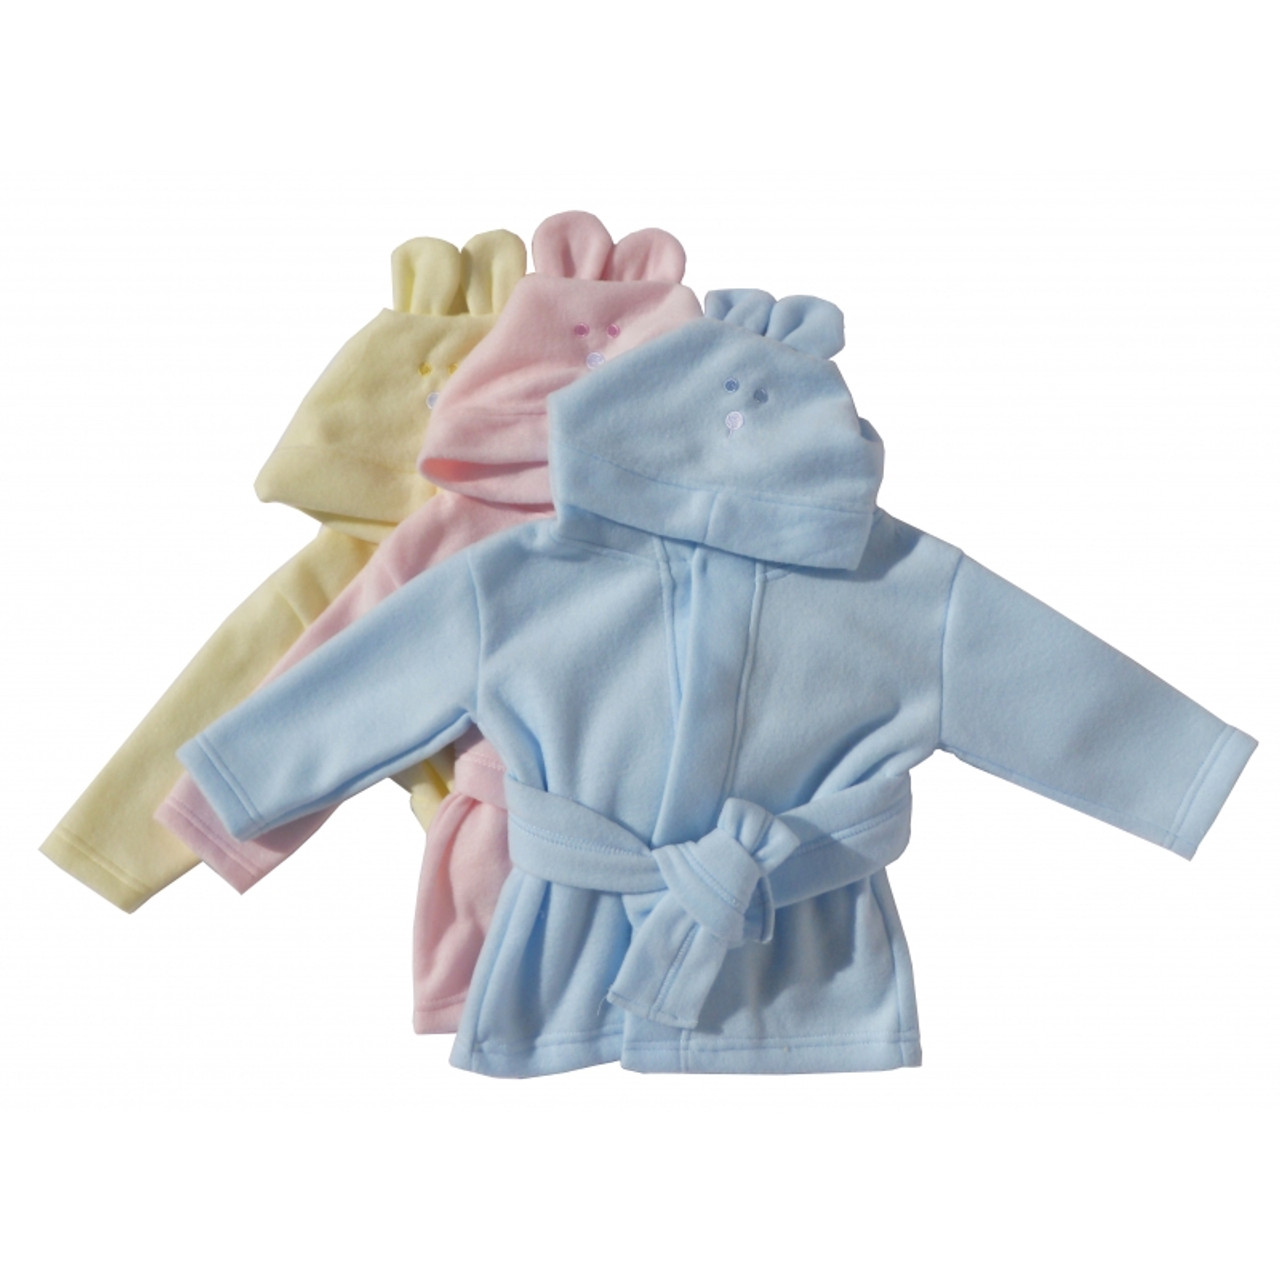 Fleece Pastel Infant Bath Robe With Rabbit Ears Hoodie